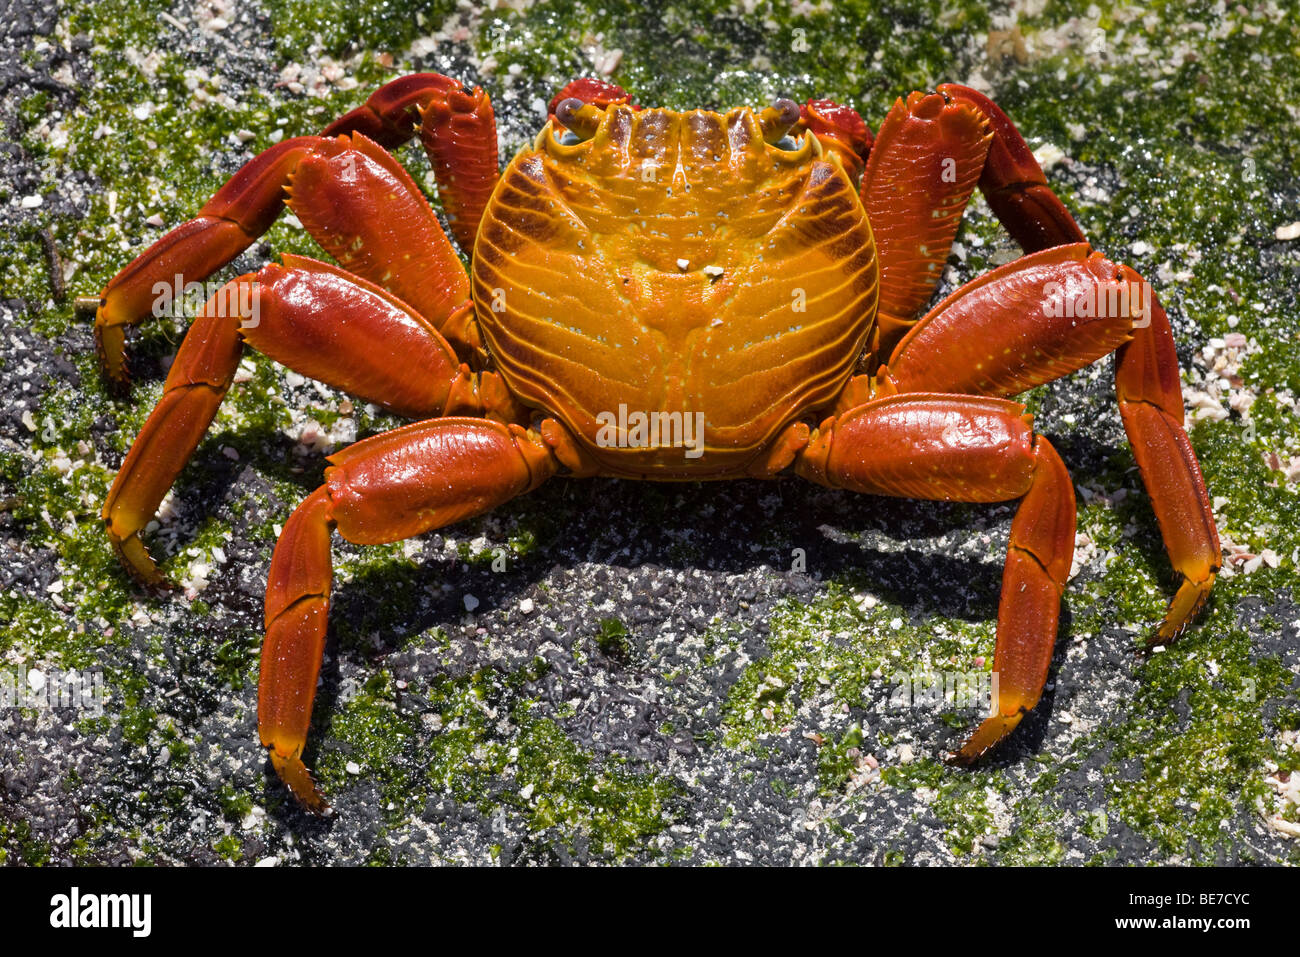 Sally Lightfoot Crab (Grapsus grapsus) in Galapagos National Park - Stock Image